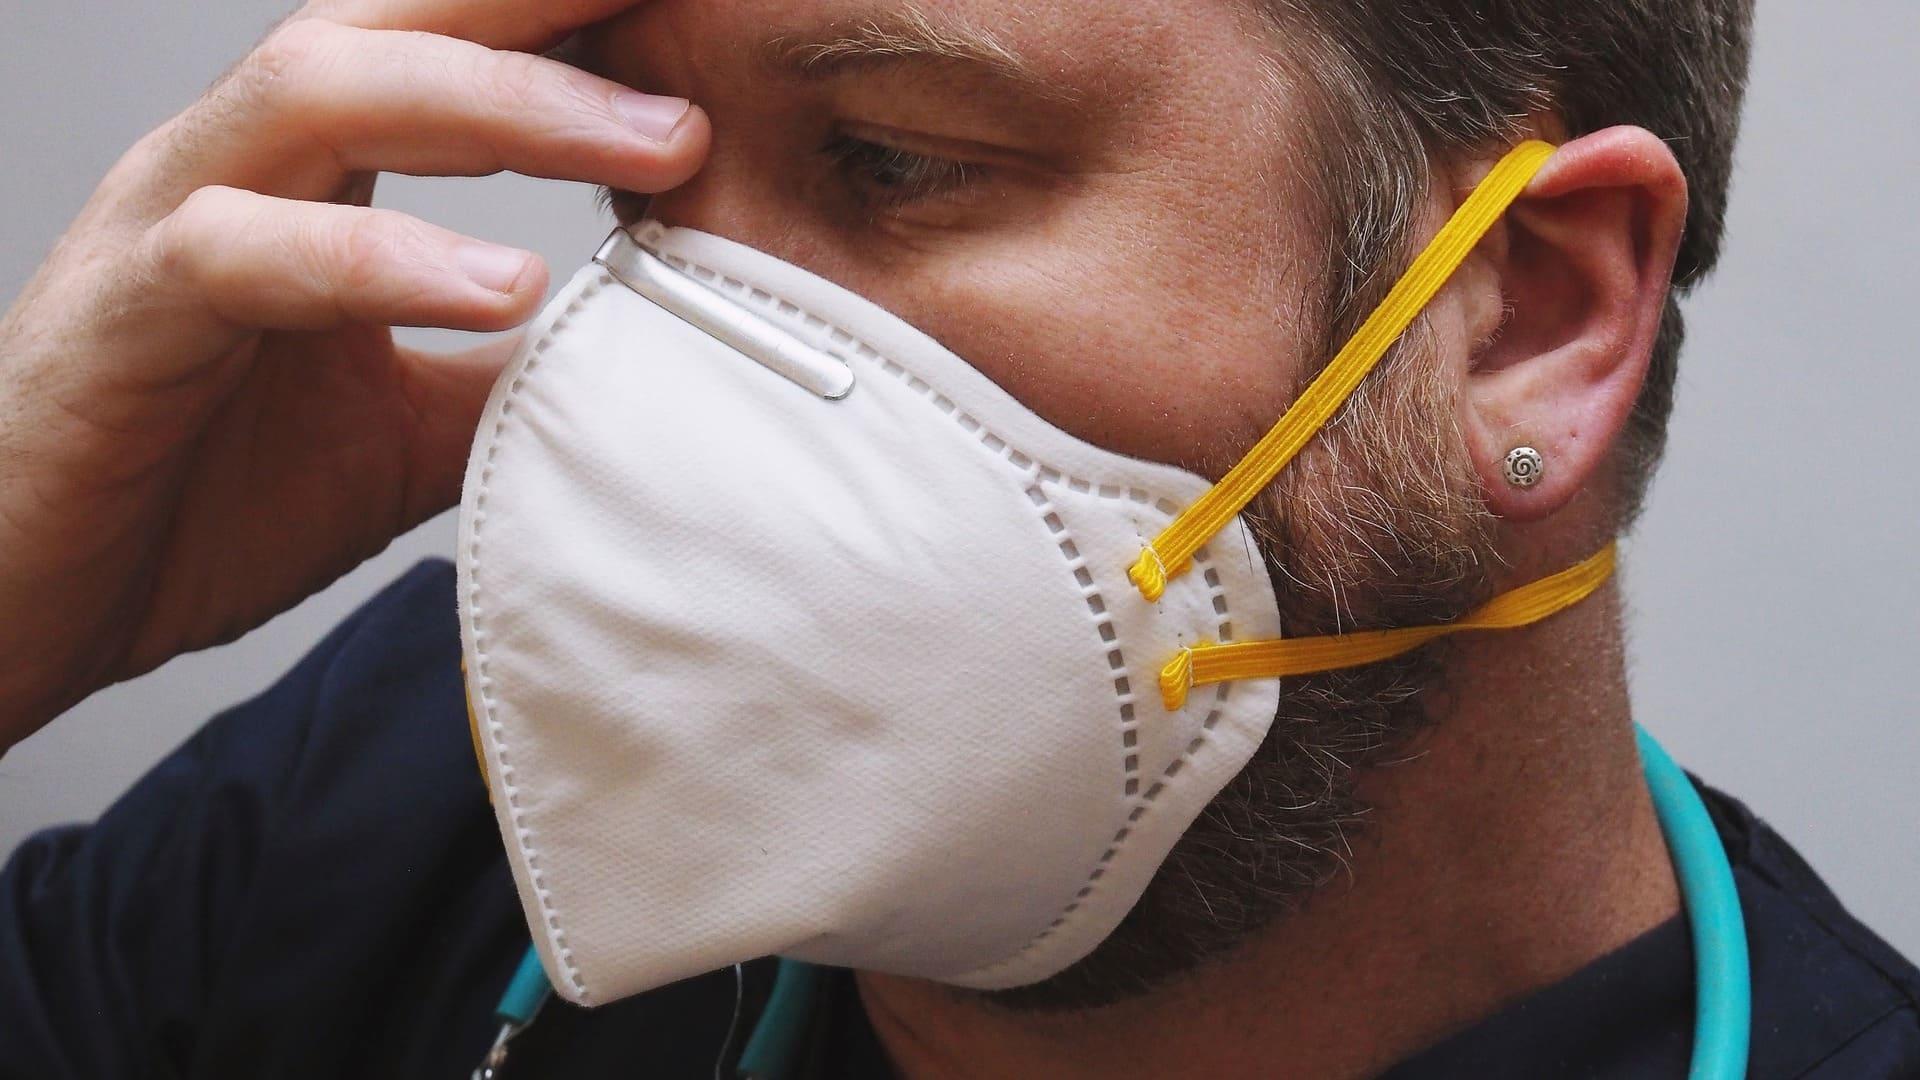 Sindrome di burnout operatori sanitari sintomi